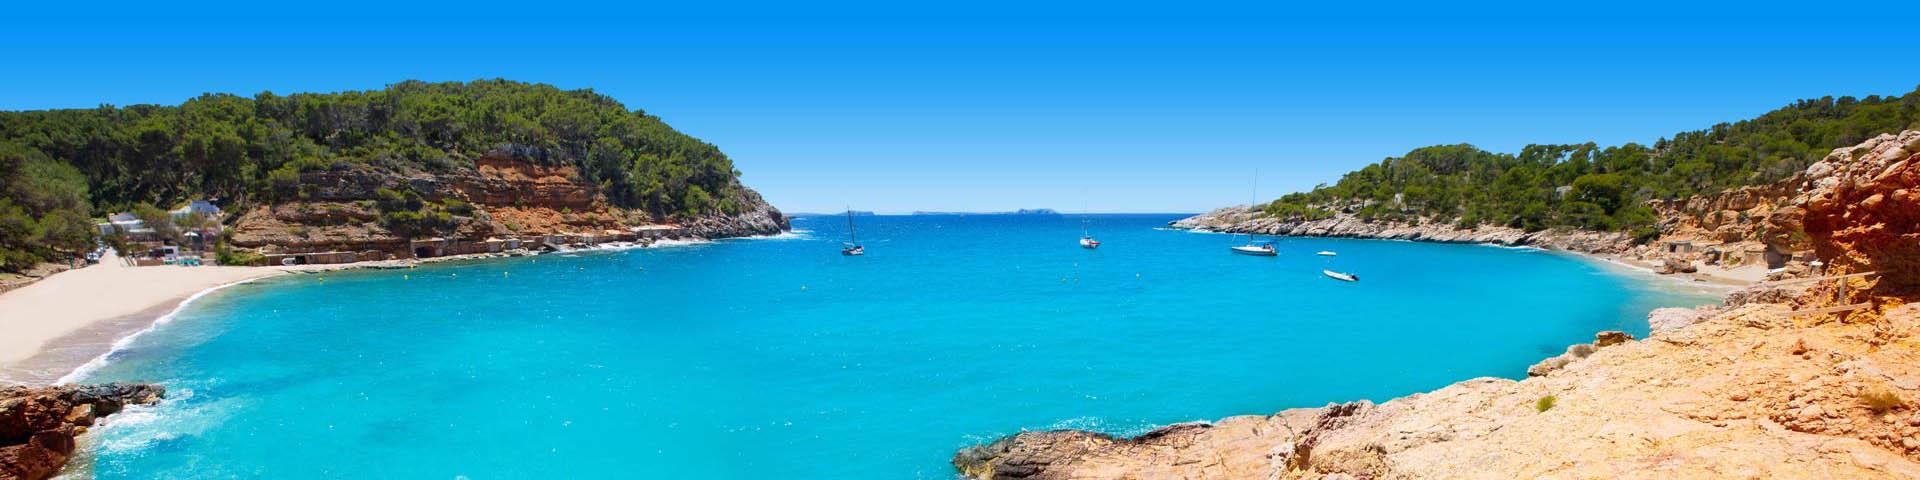 Strand bij Ibiza Cala Salada